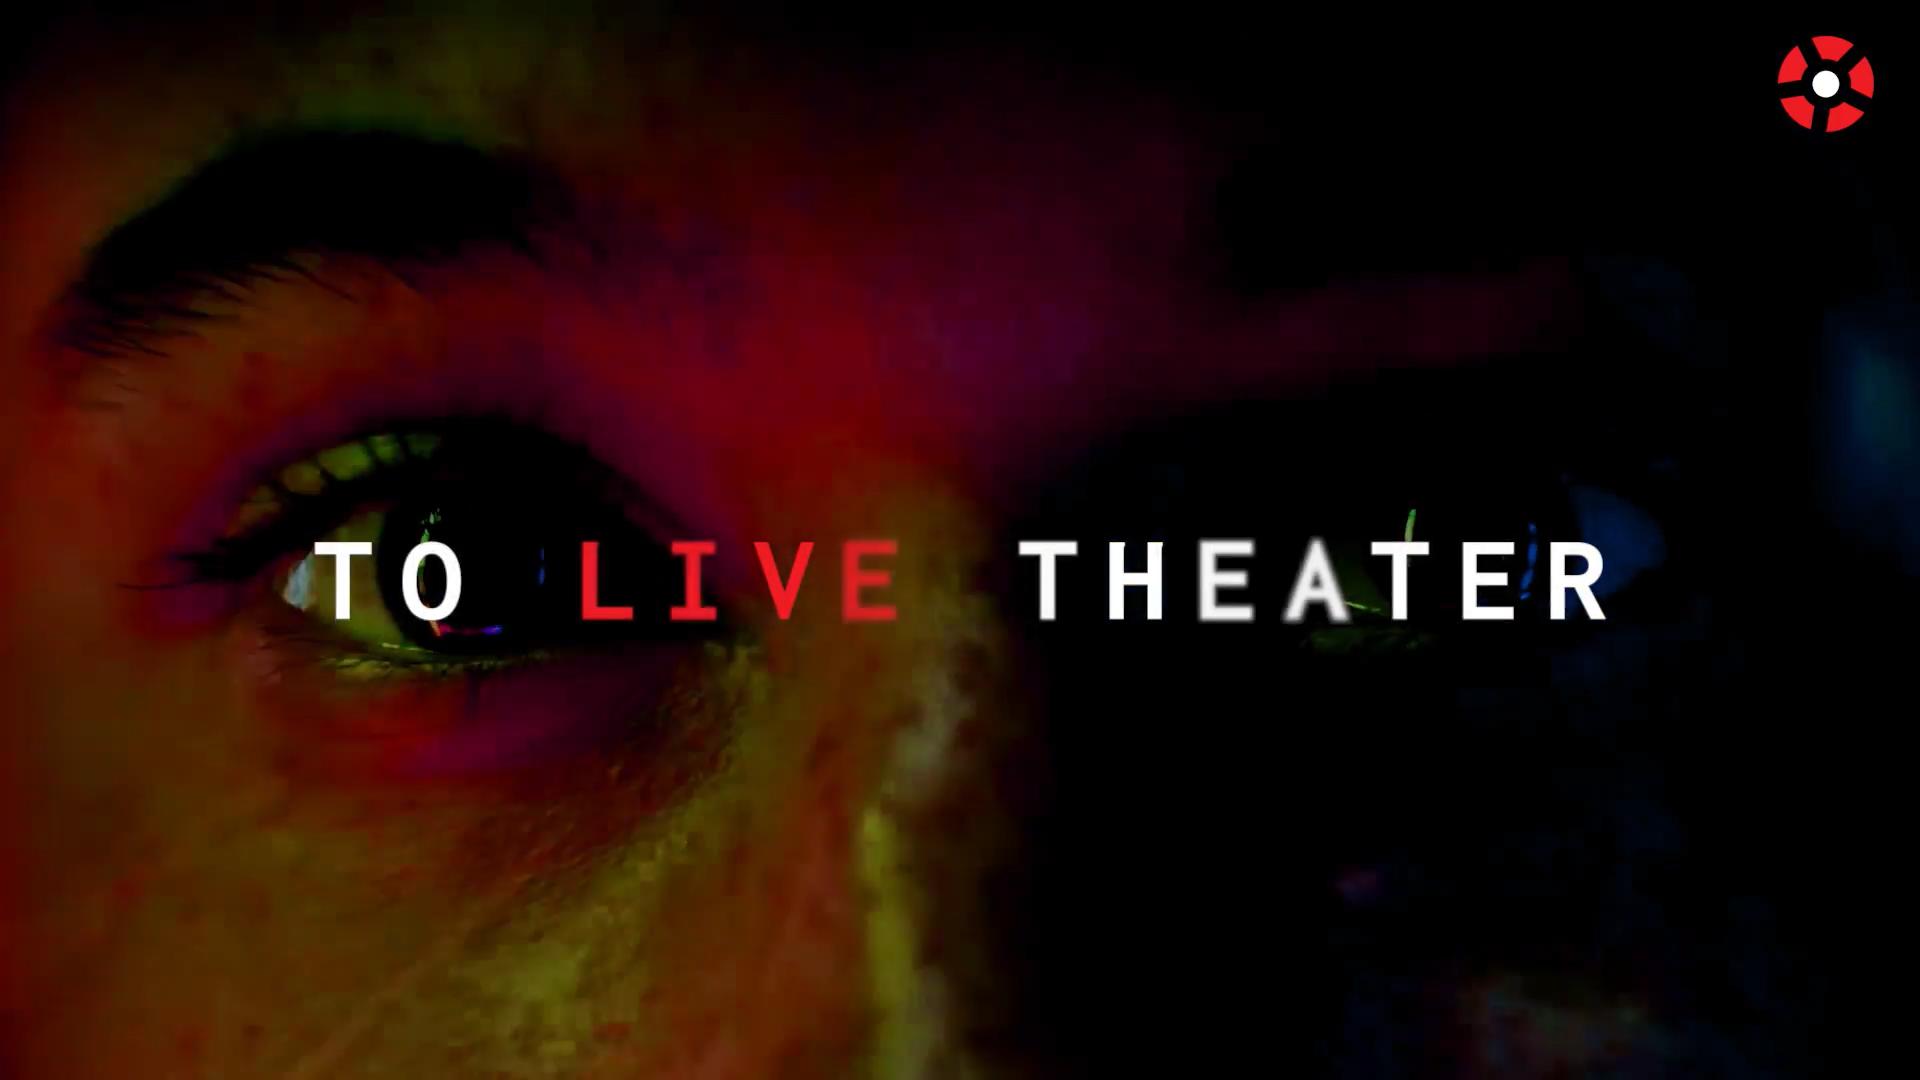 teatro-realidad-virtual-cannes-xr-iamvr